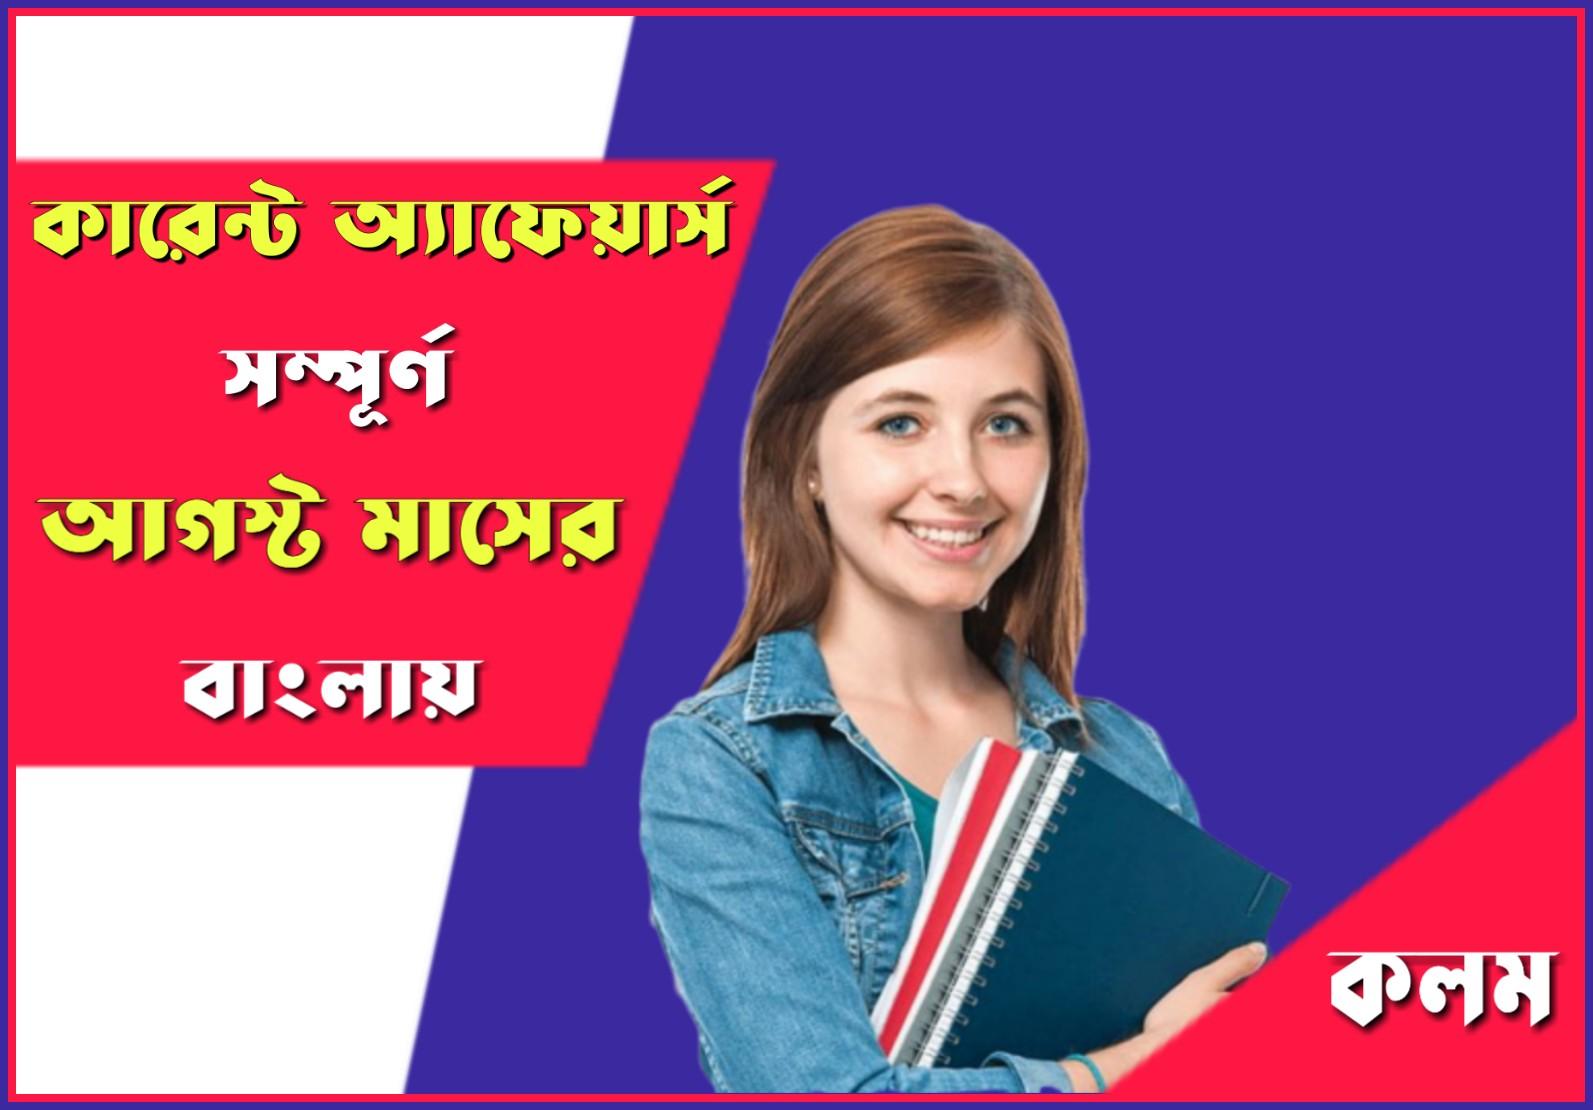 Bengali Current Affairs : August 2019 Full Month Current Affairs In Bengali PDF - ২০১৯ সালের আগস্ট মাসের কারেন্ট অ্যাফেয়ার্স পিডিএফ